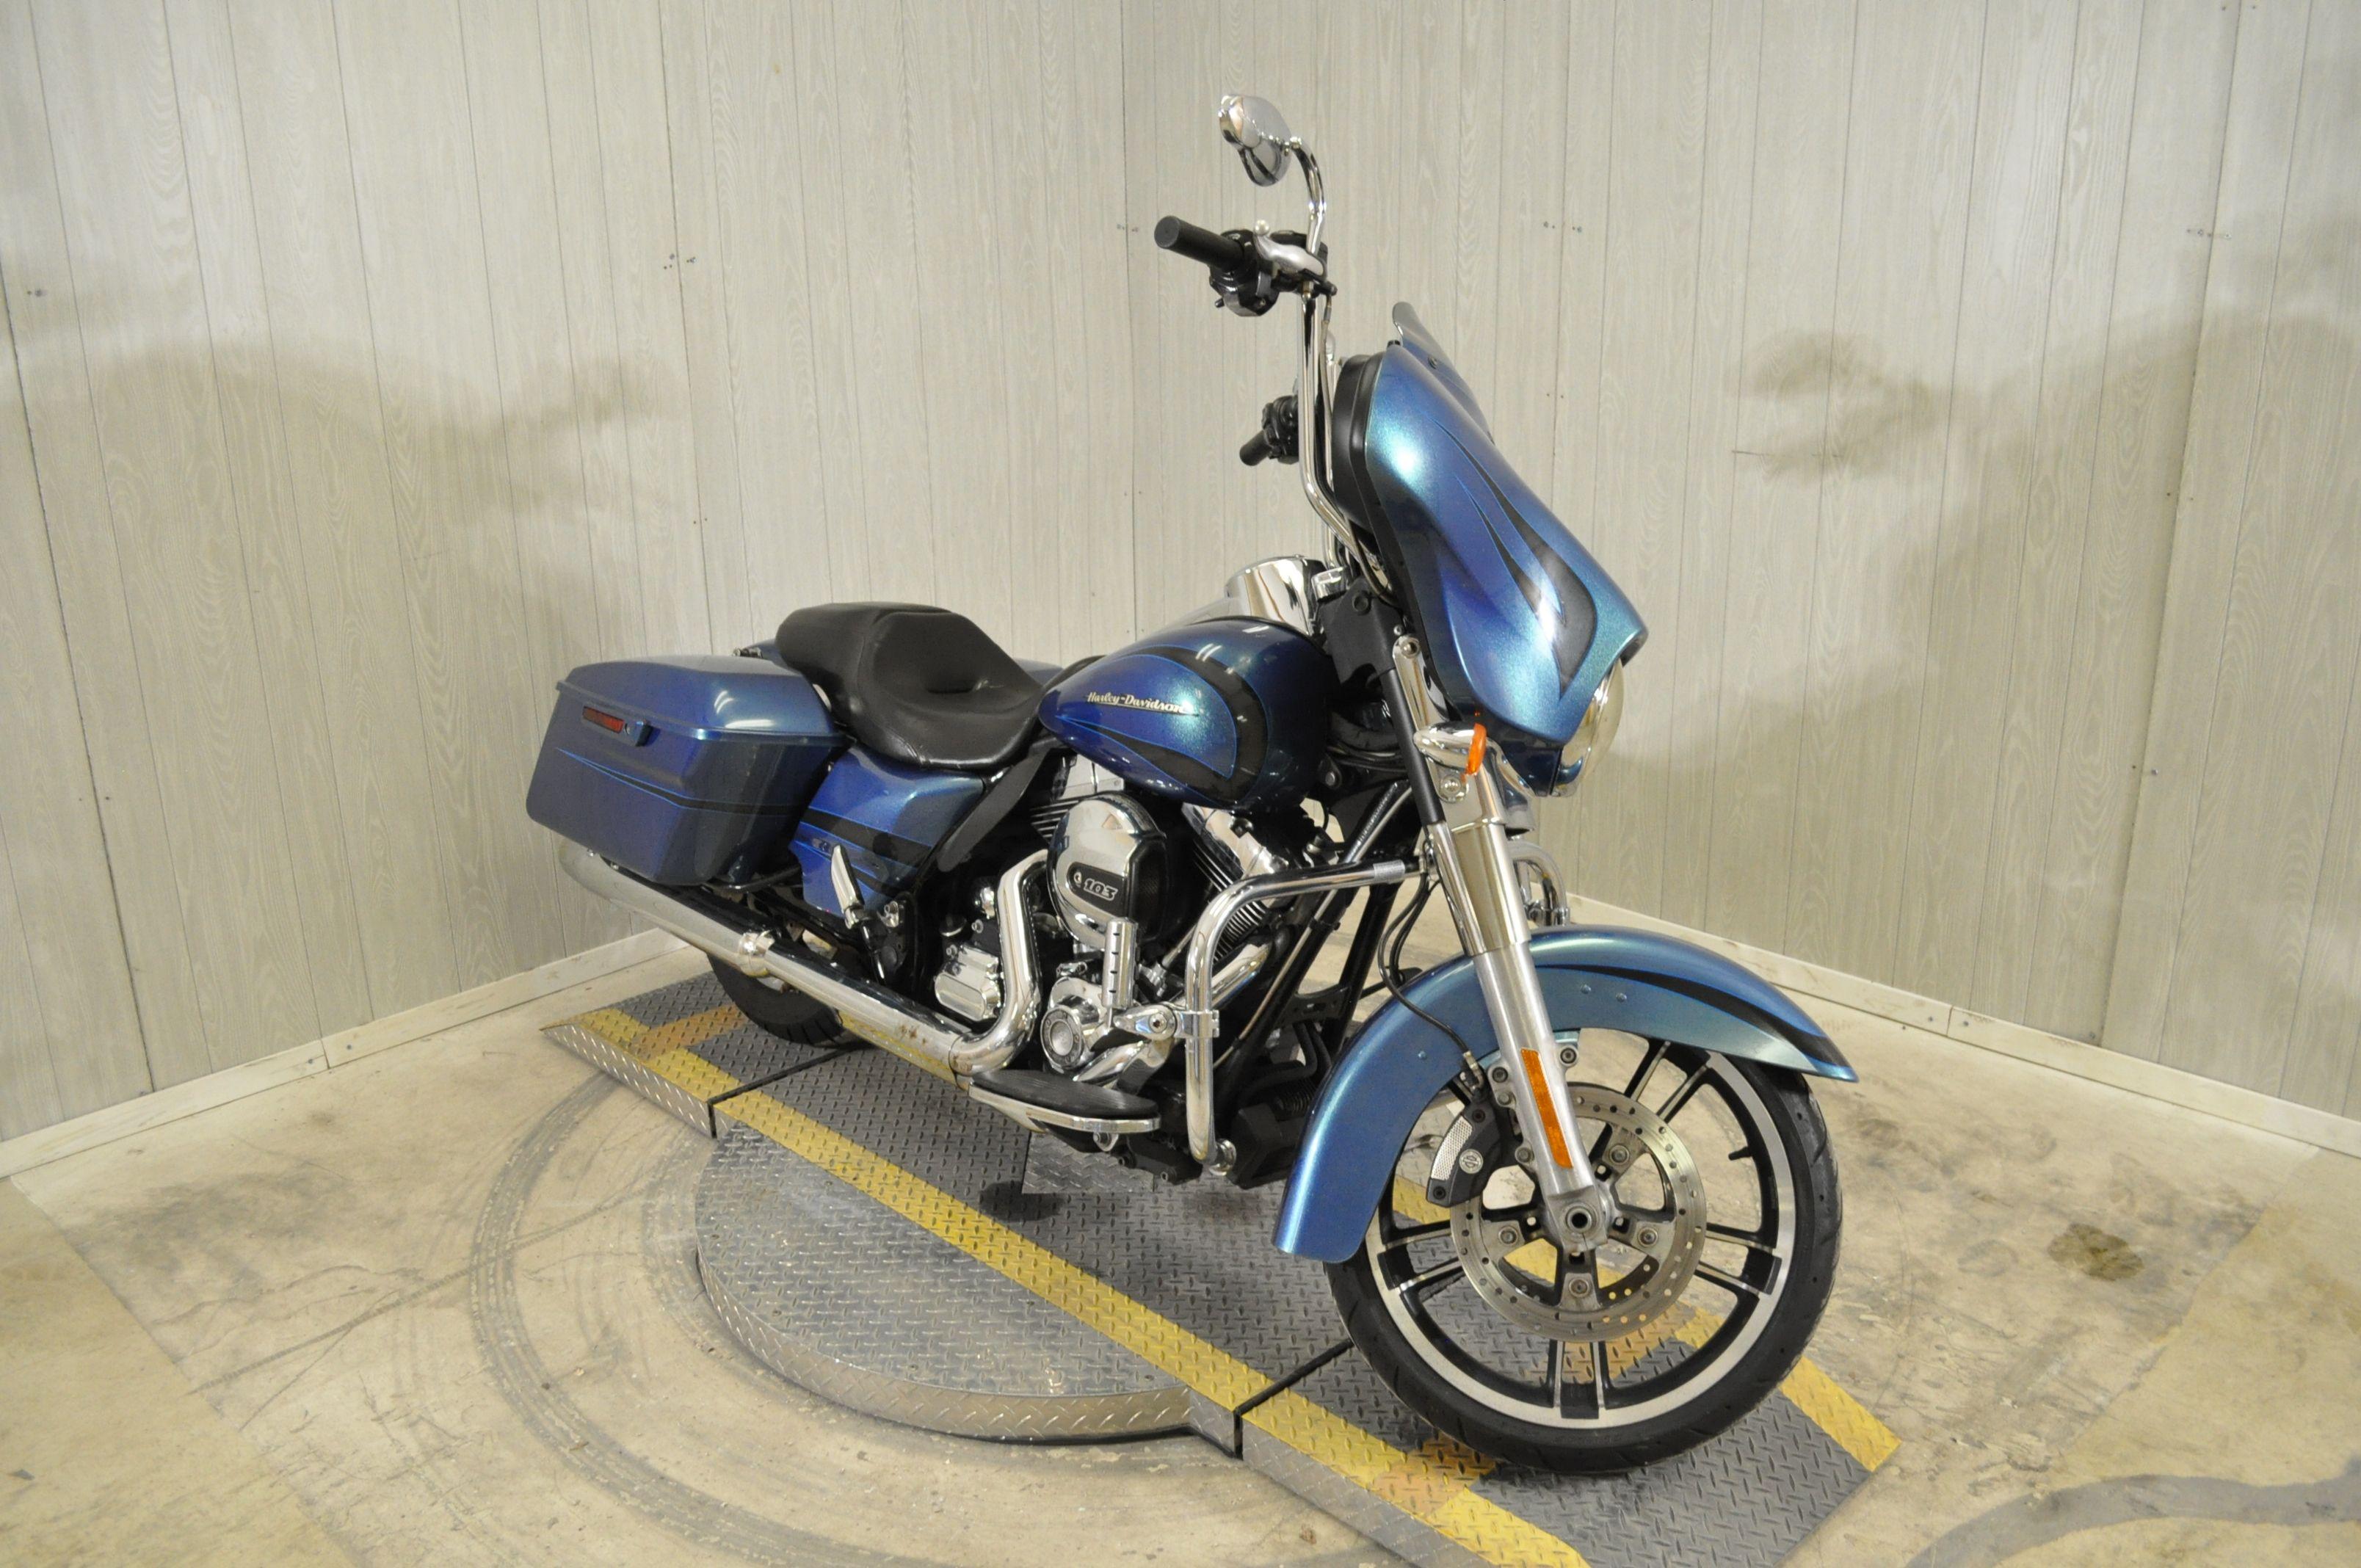 Pre-Owned 2014 Harley-Davidson Street Glide FLHX